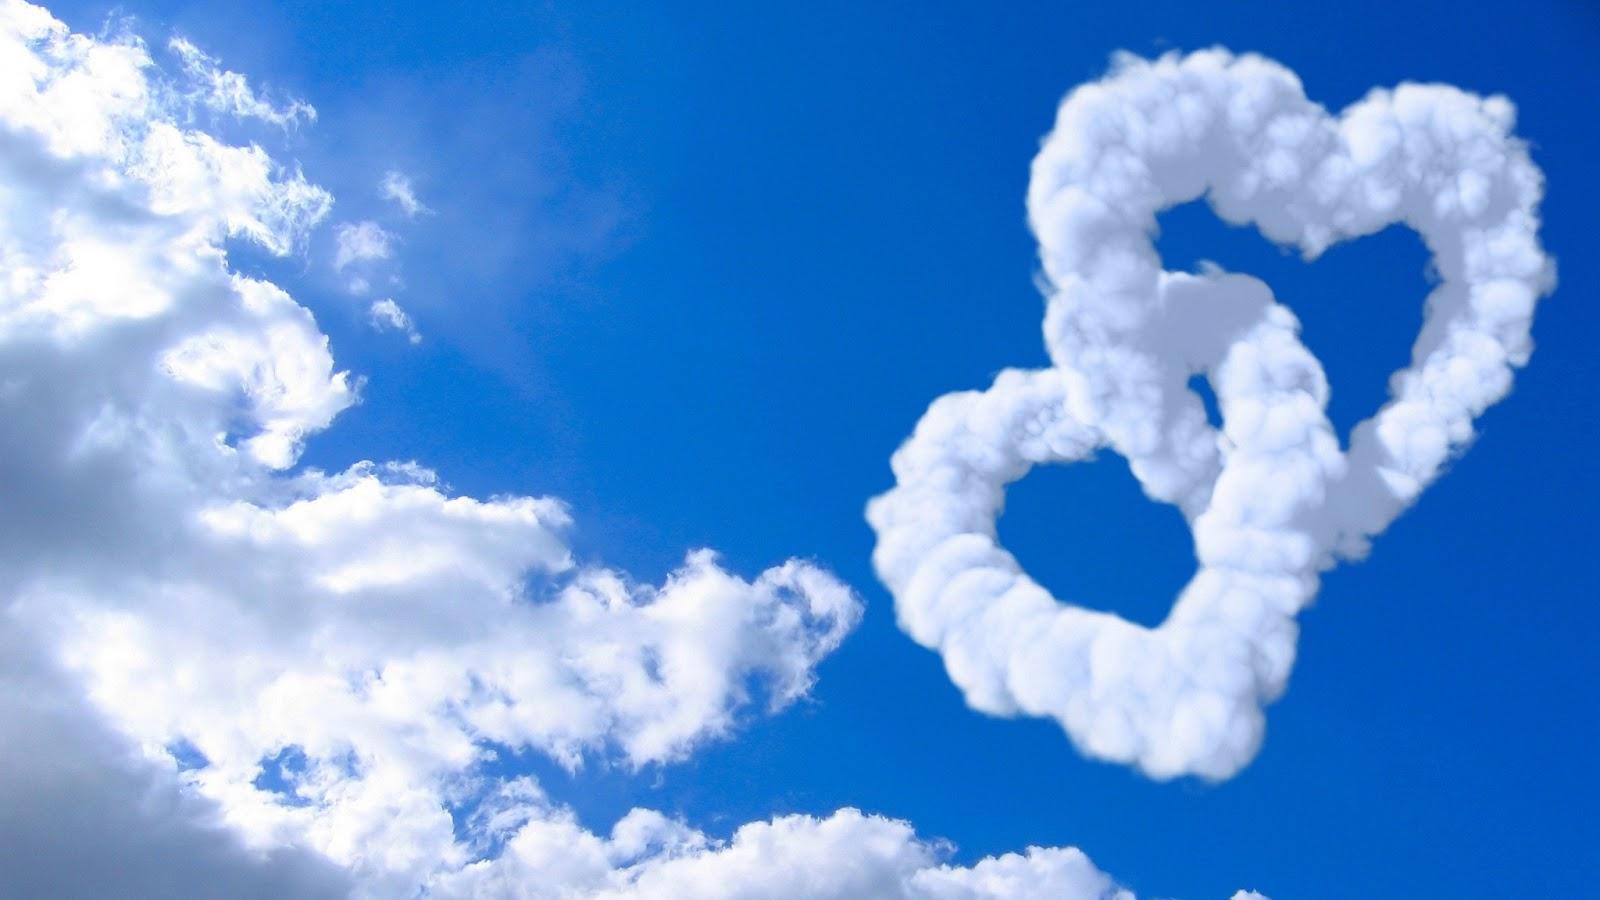 Tidak Jadi Menikah, Bisakah Dikumpulkan Di Surga Bersama yang Dicintai bimbingan islam